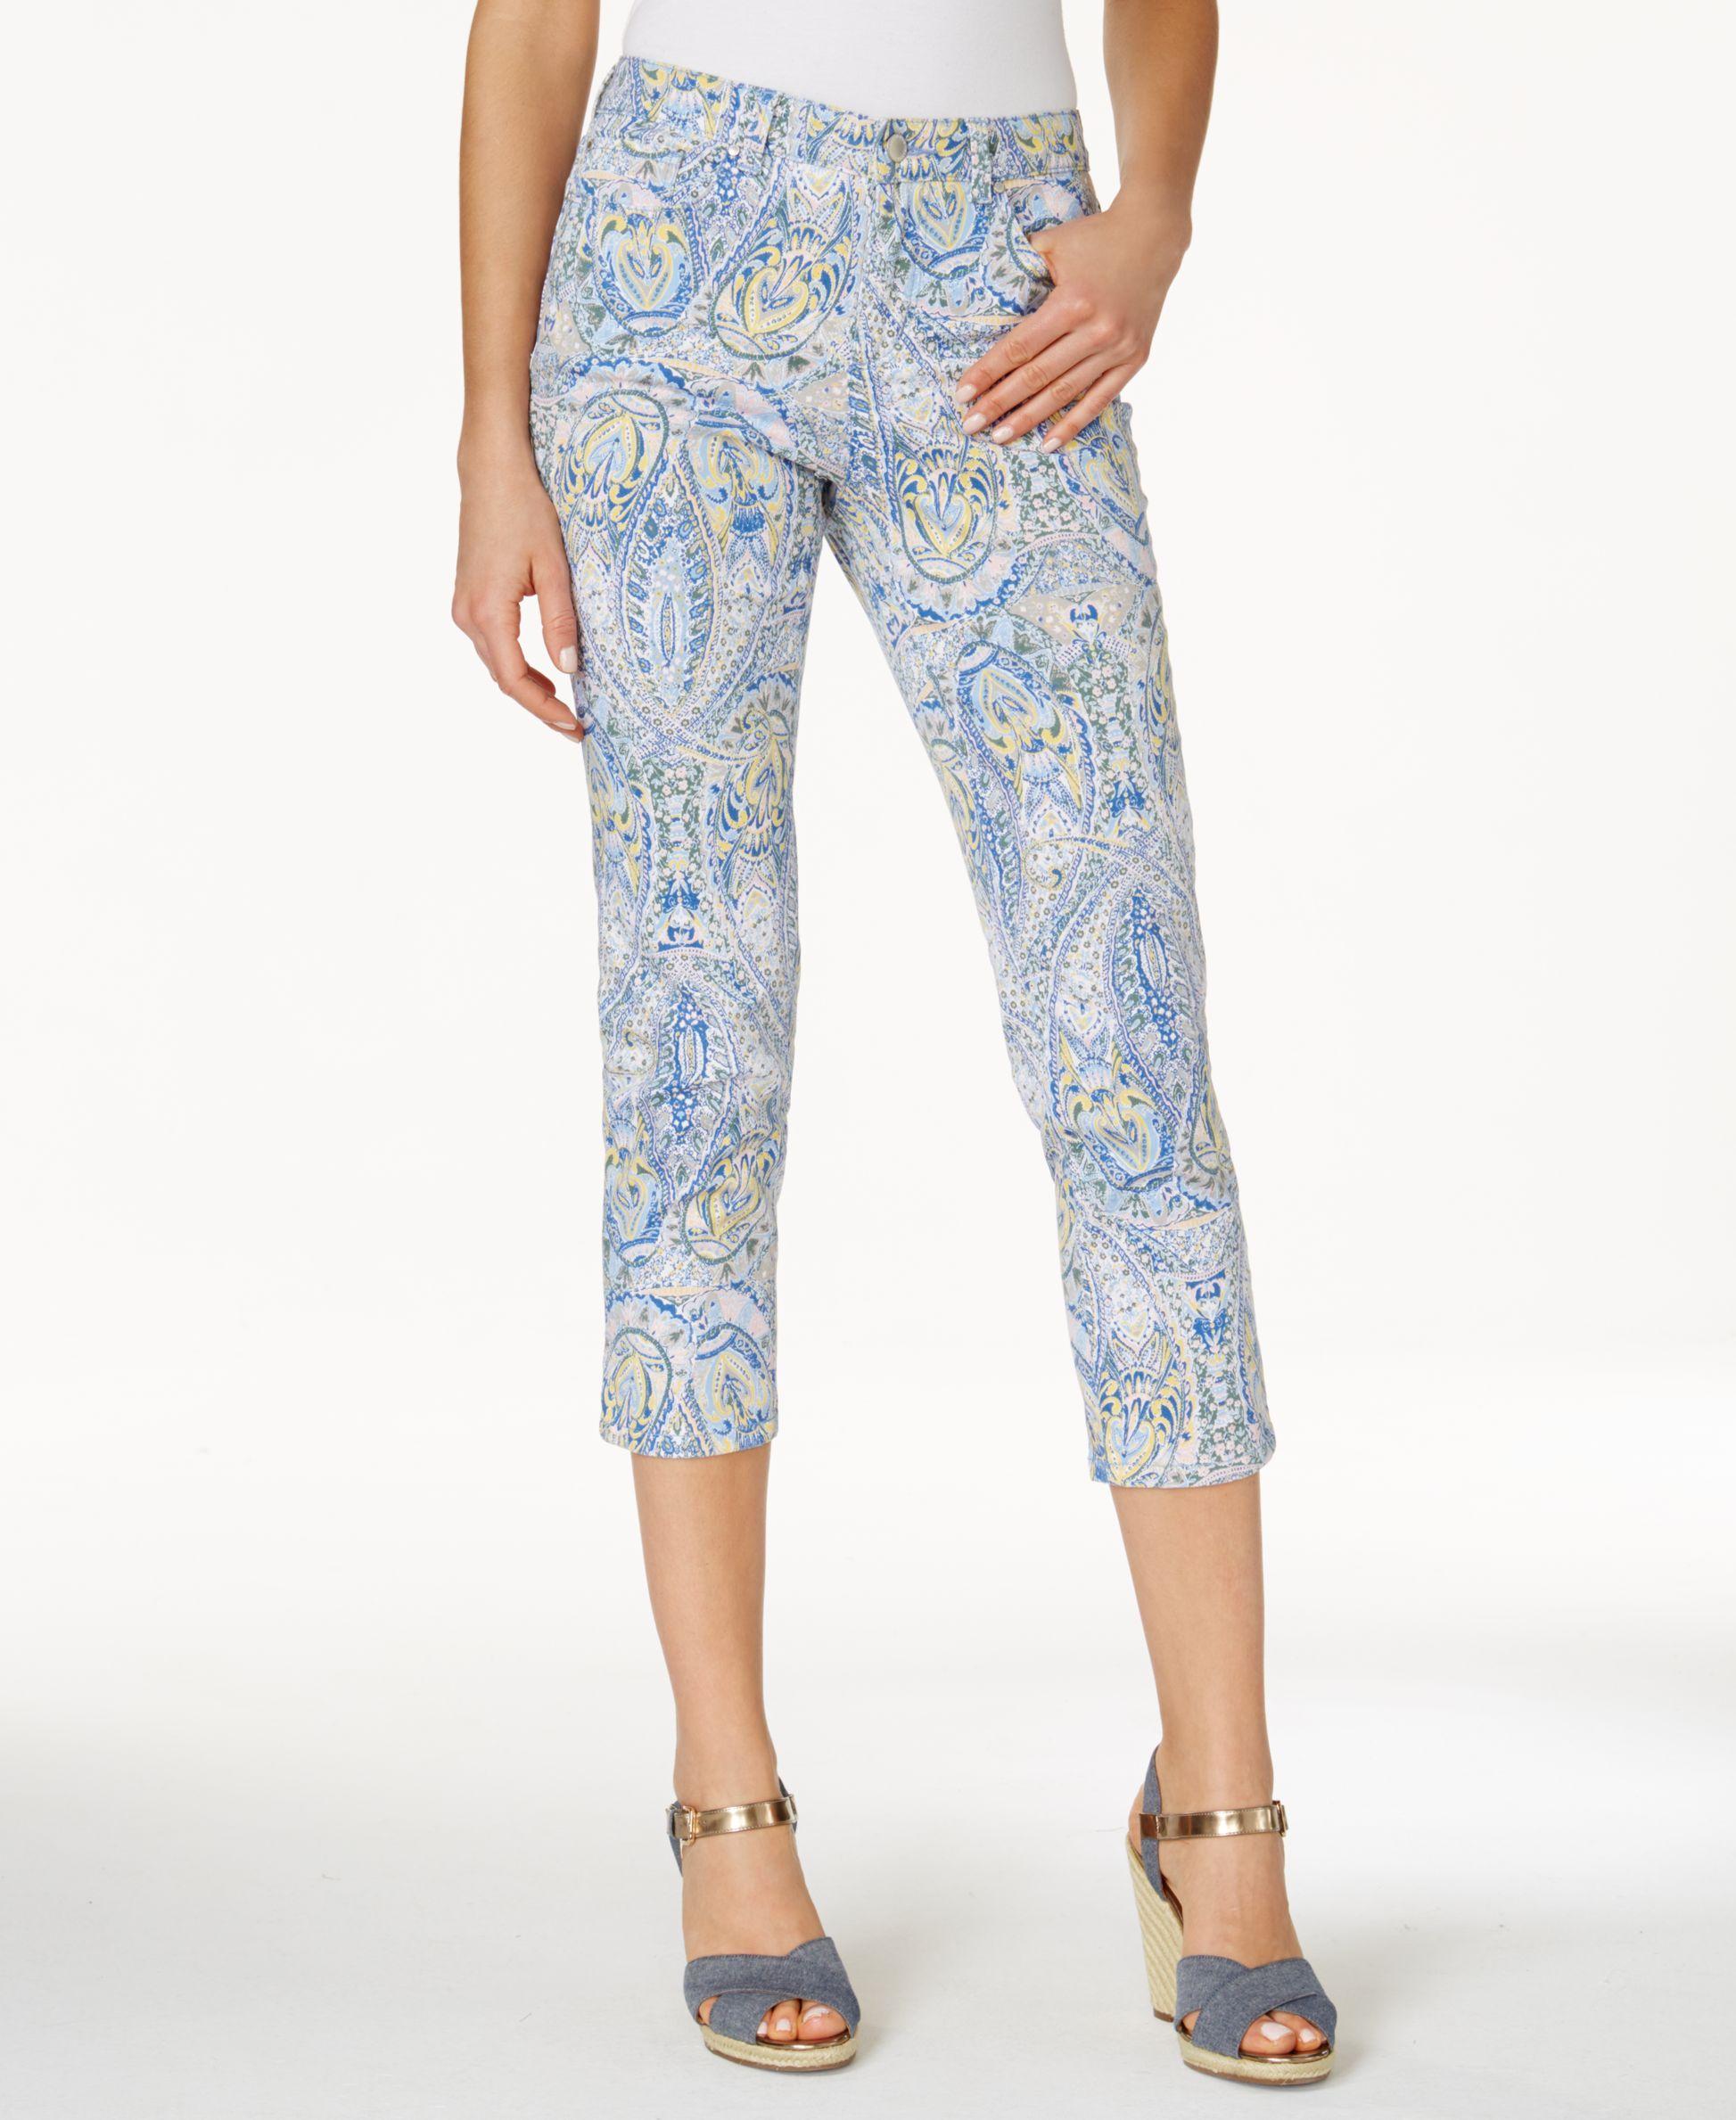 12e4be4fbf0 Charter Club Bristol Print Capri Jeans